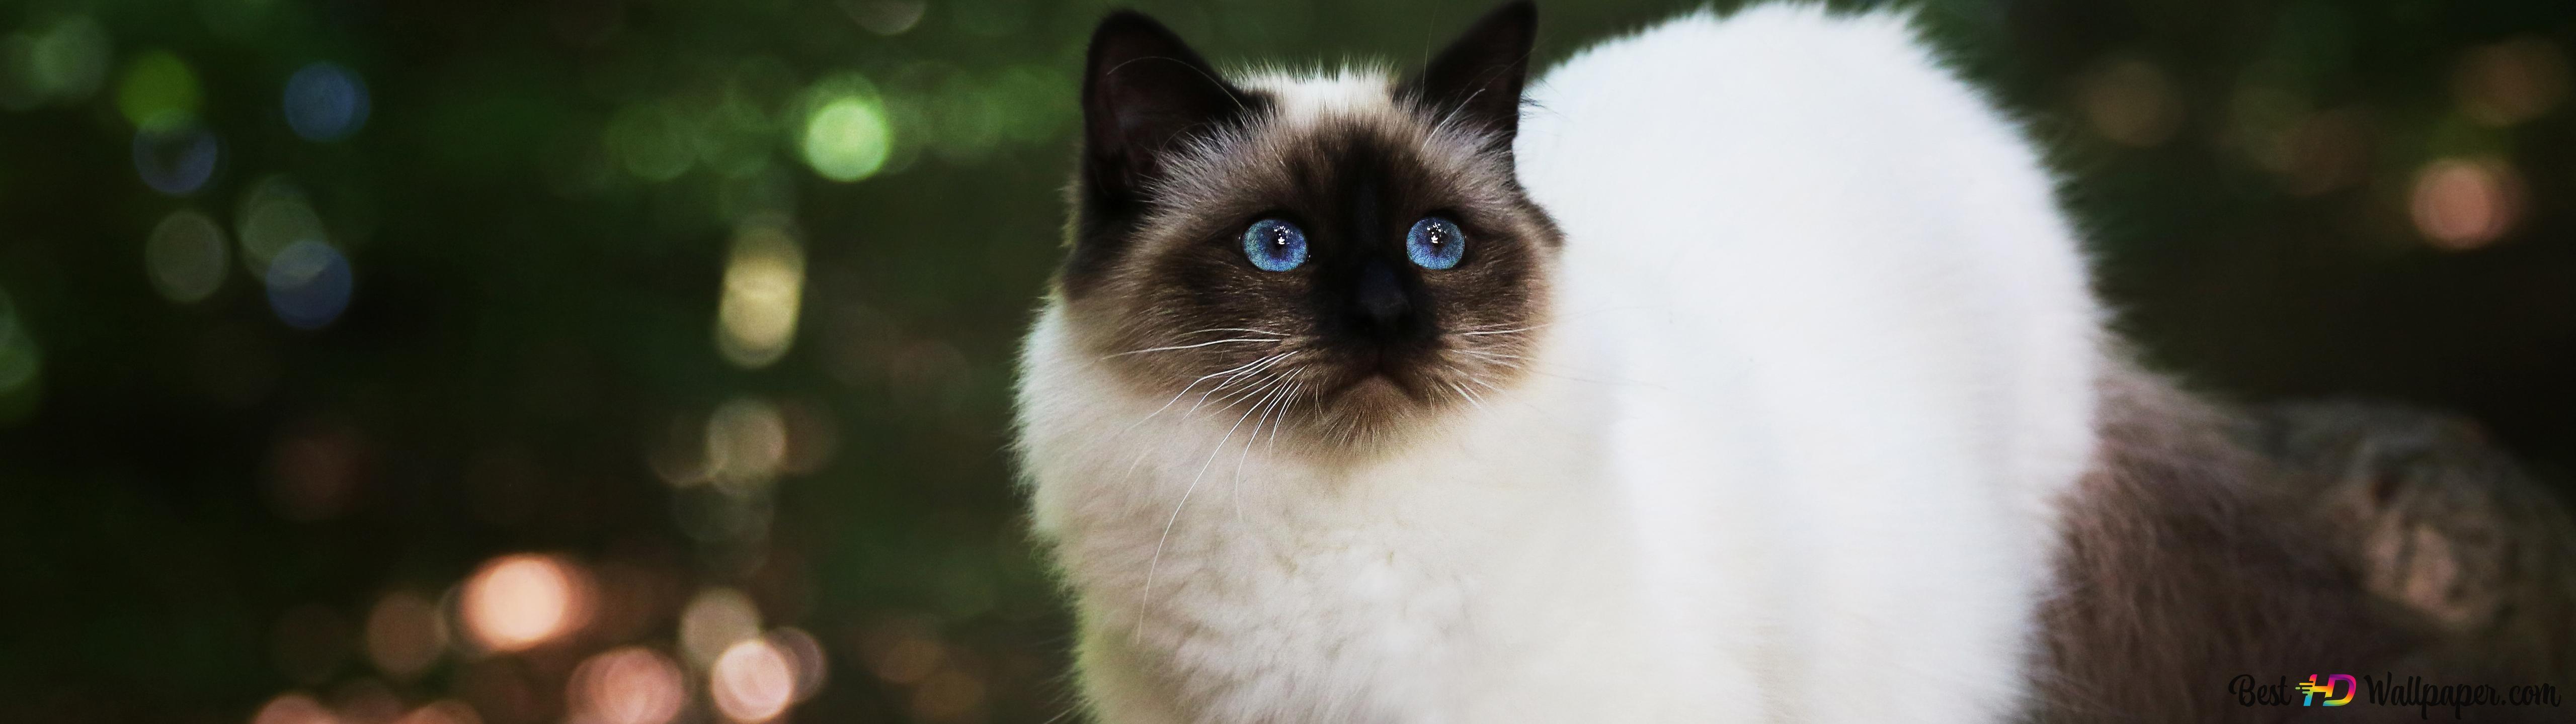 Himalayan Blue Eyed Cat Hd Wallpaper Download